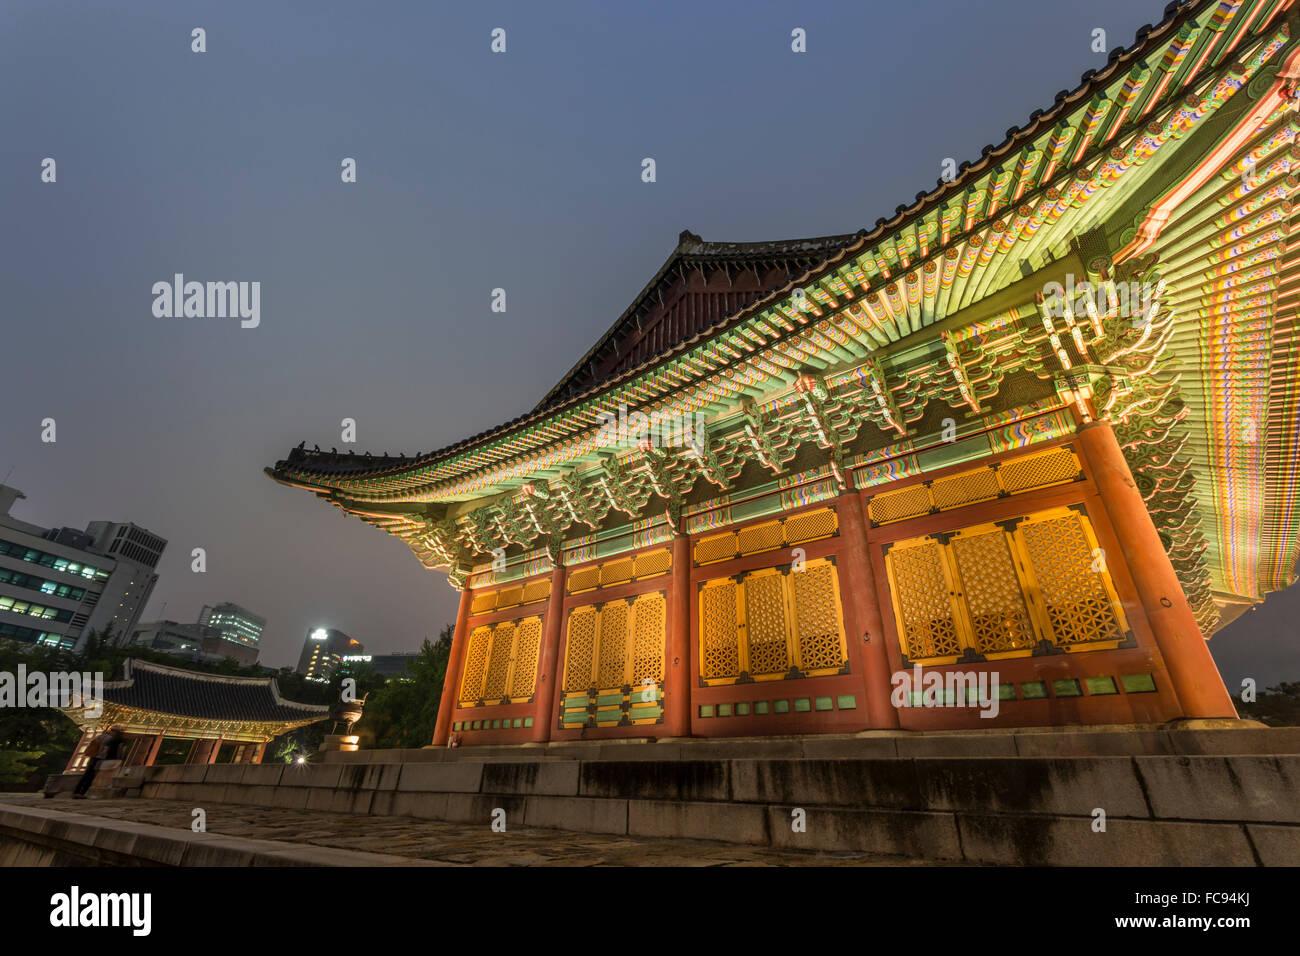 Junghwa-jeon (Throne Hall), Deoksugung Palace, traditional Korean building, illuminated at dusk, Seoul, South Korea, - Stock Image